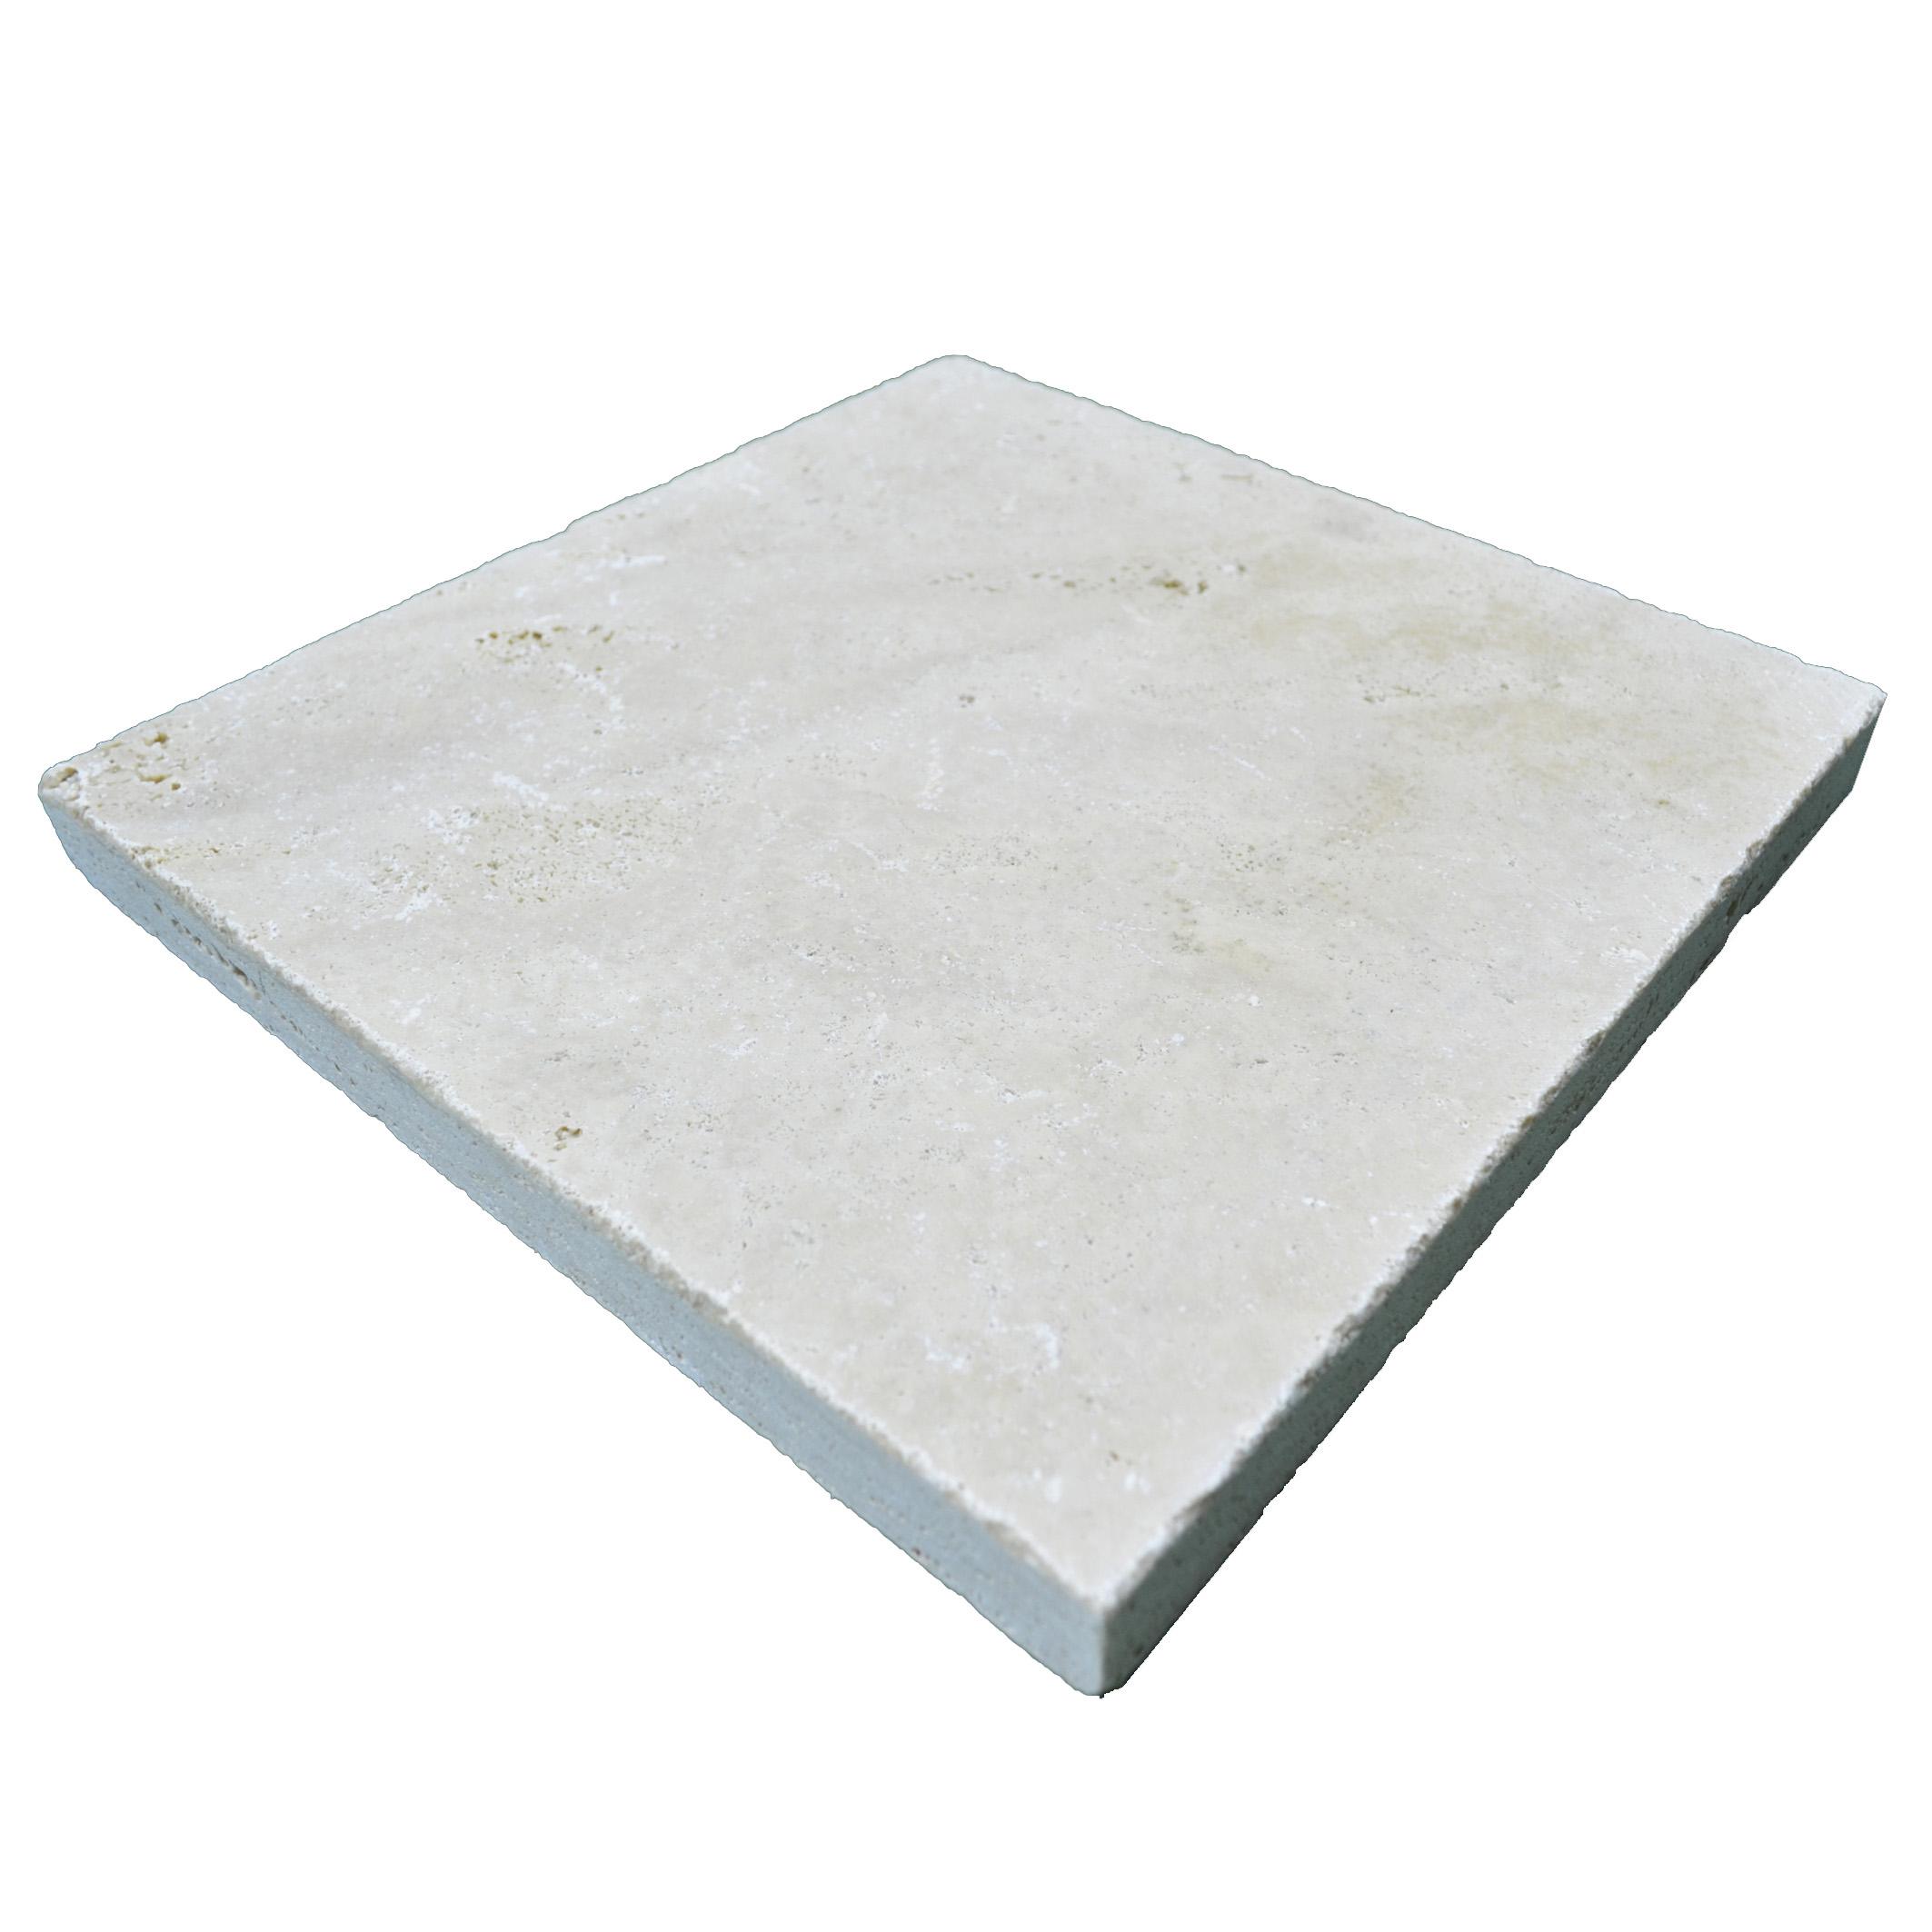 Ivory Tumbled Travertine Pavers 16×16-pavers sale-Atlantic Stone Source